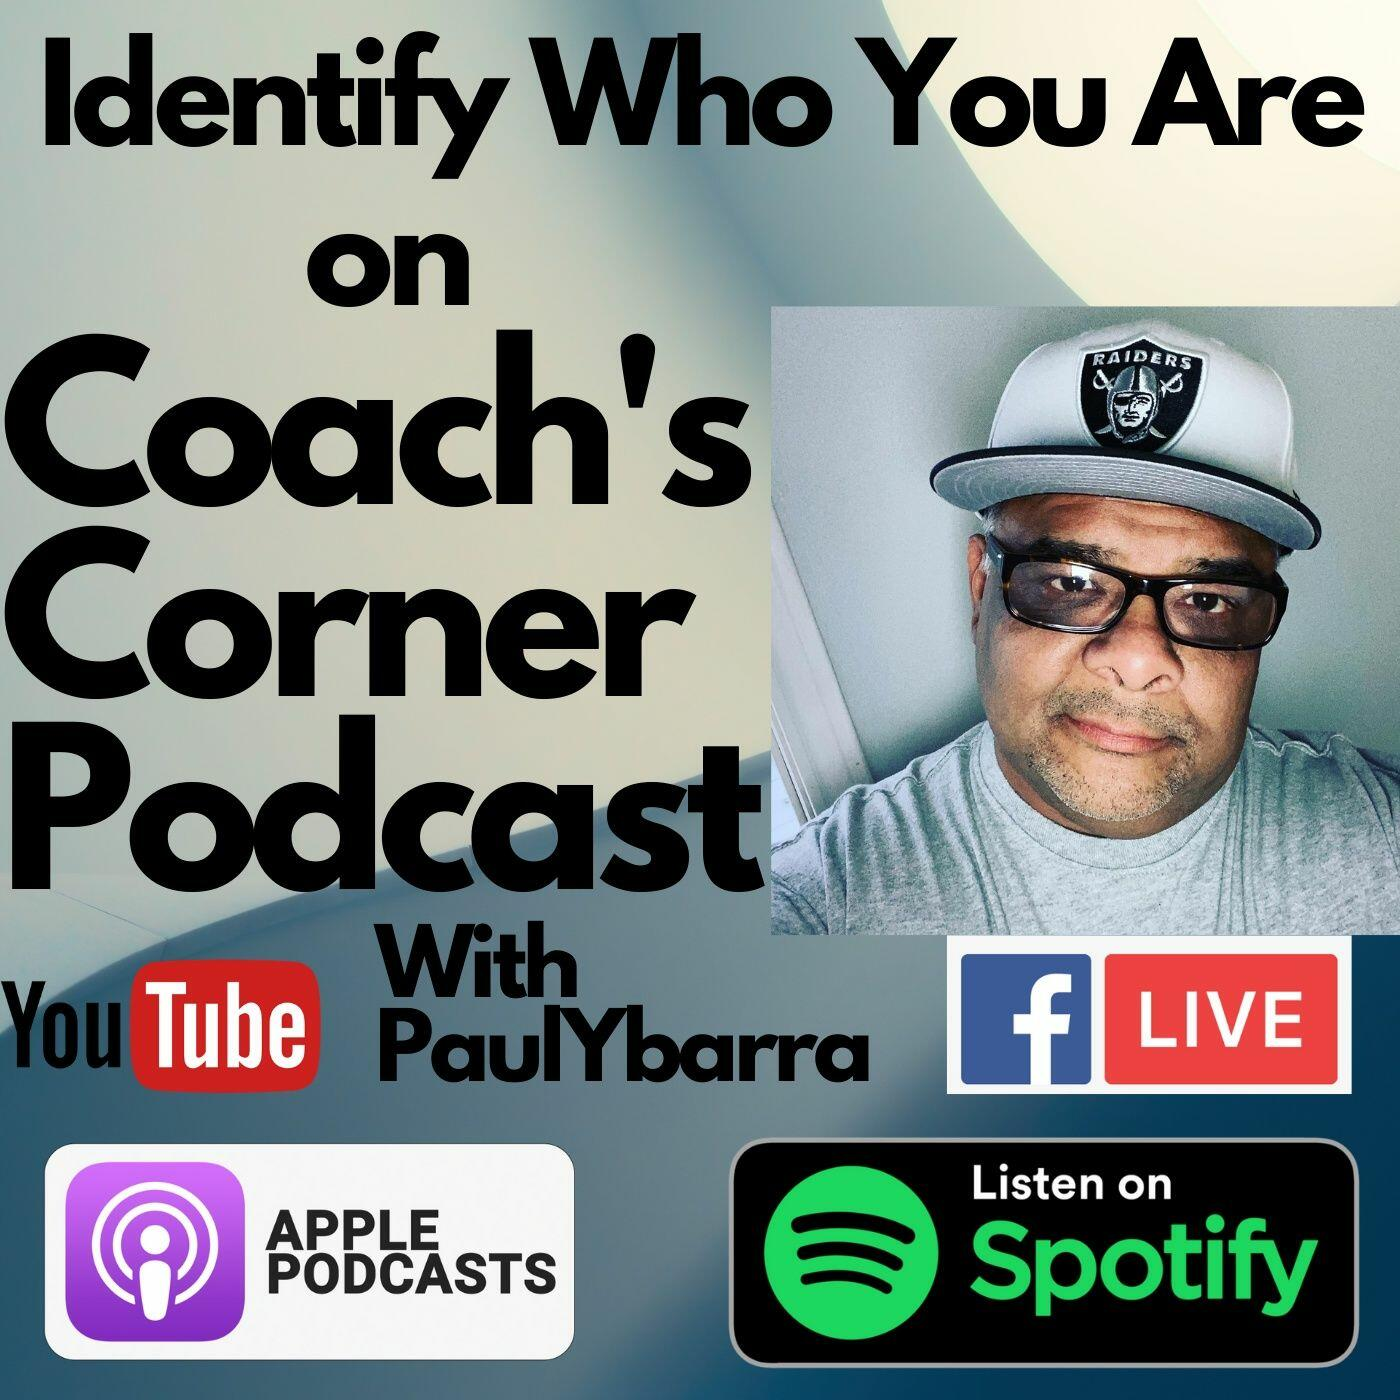 Coach's Corner with Paul Ybarra